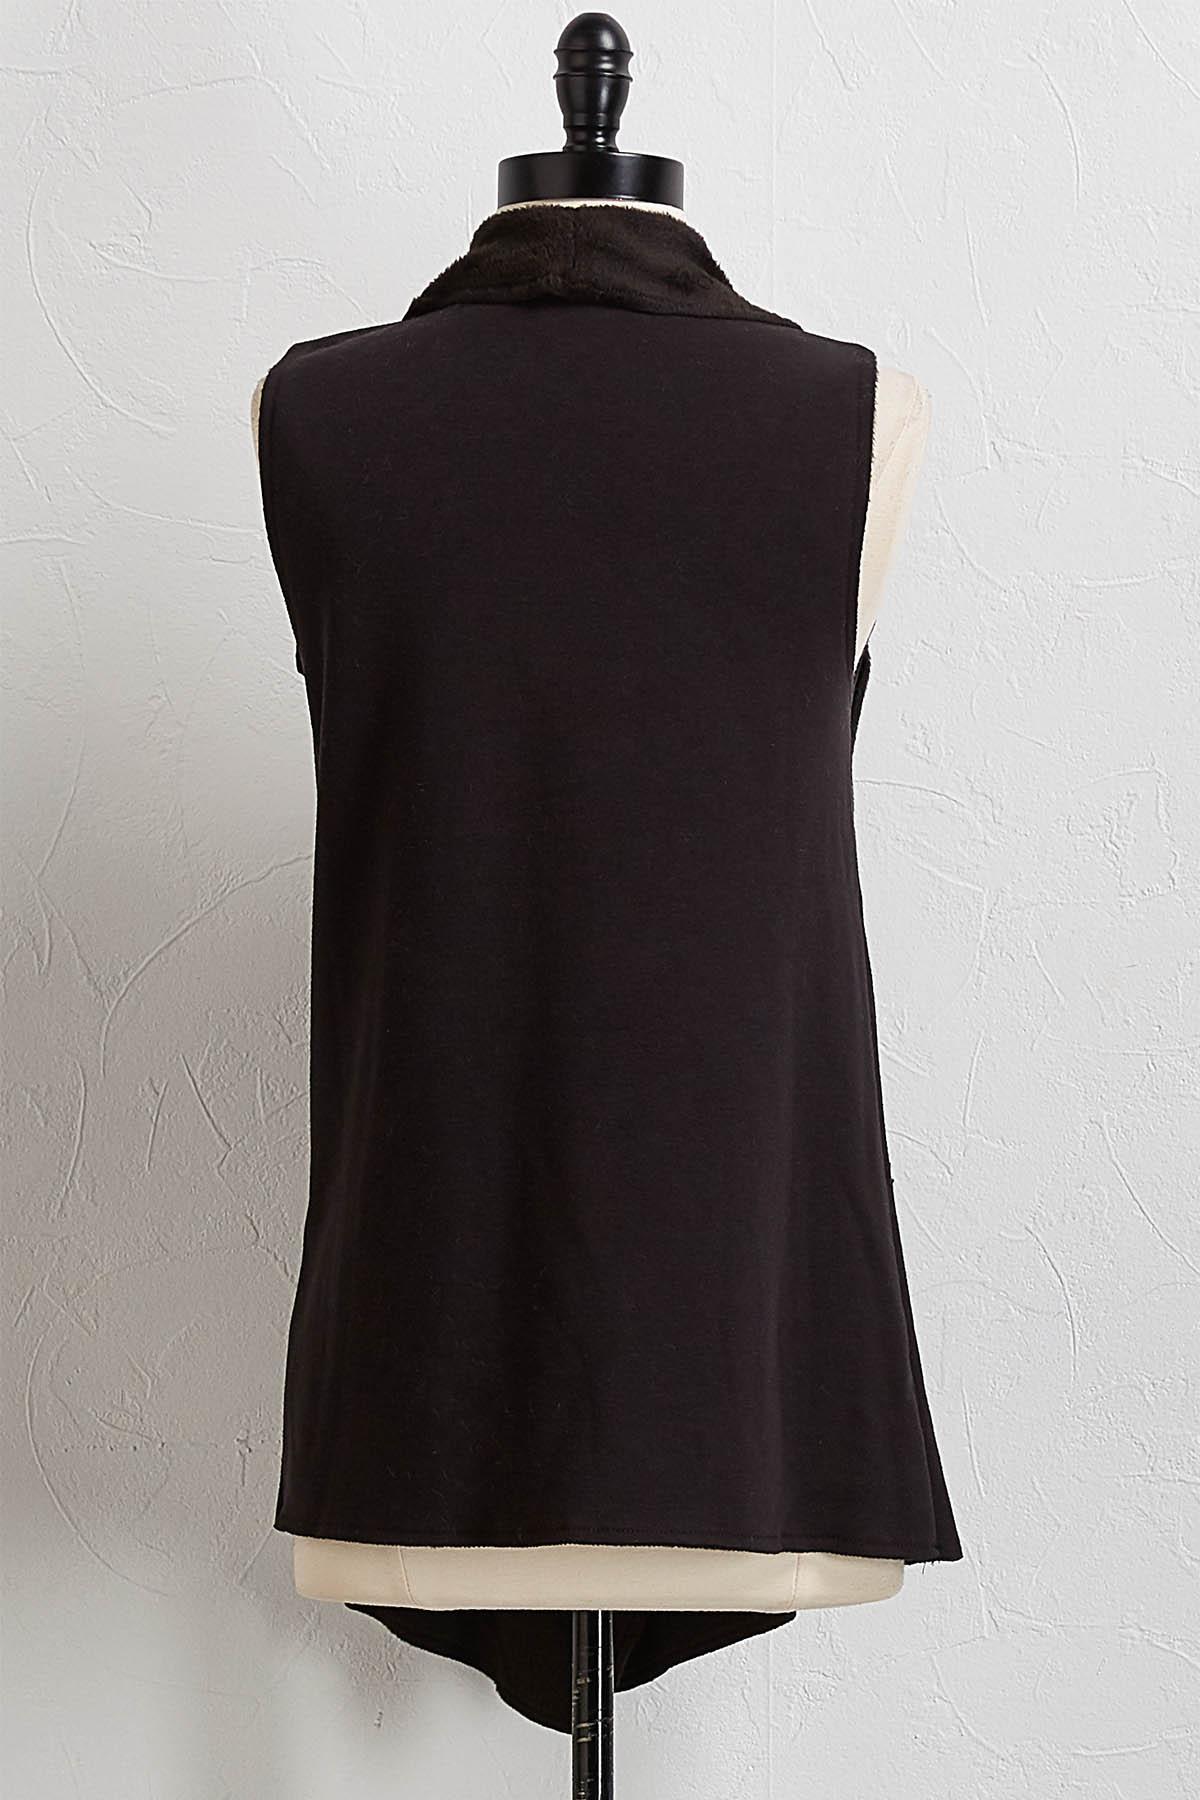 Fleece Lined Vest